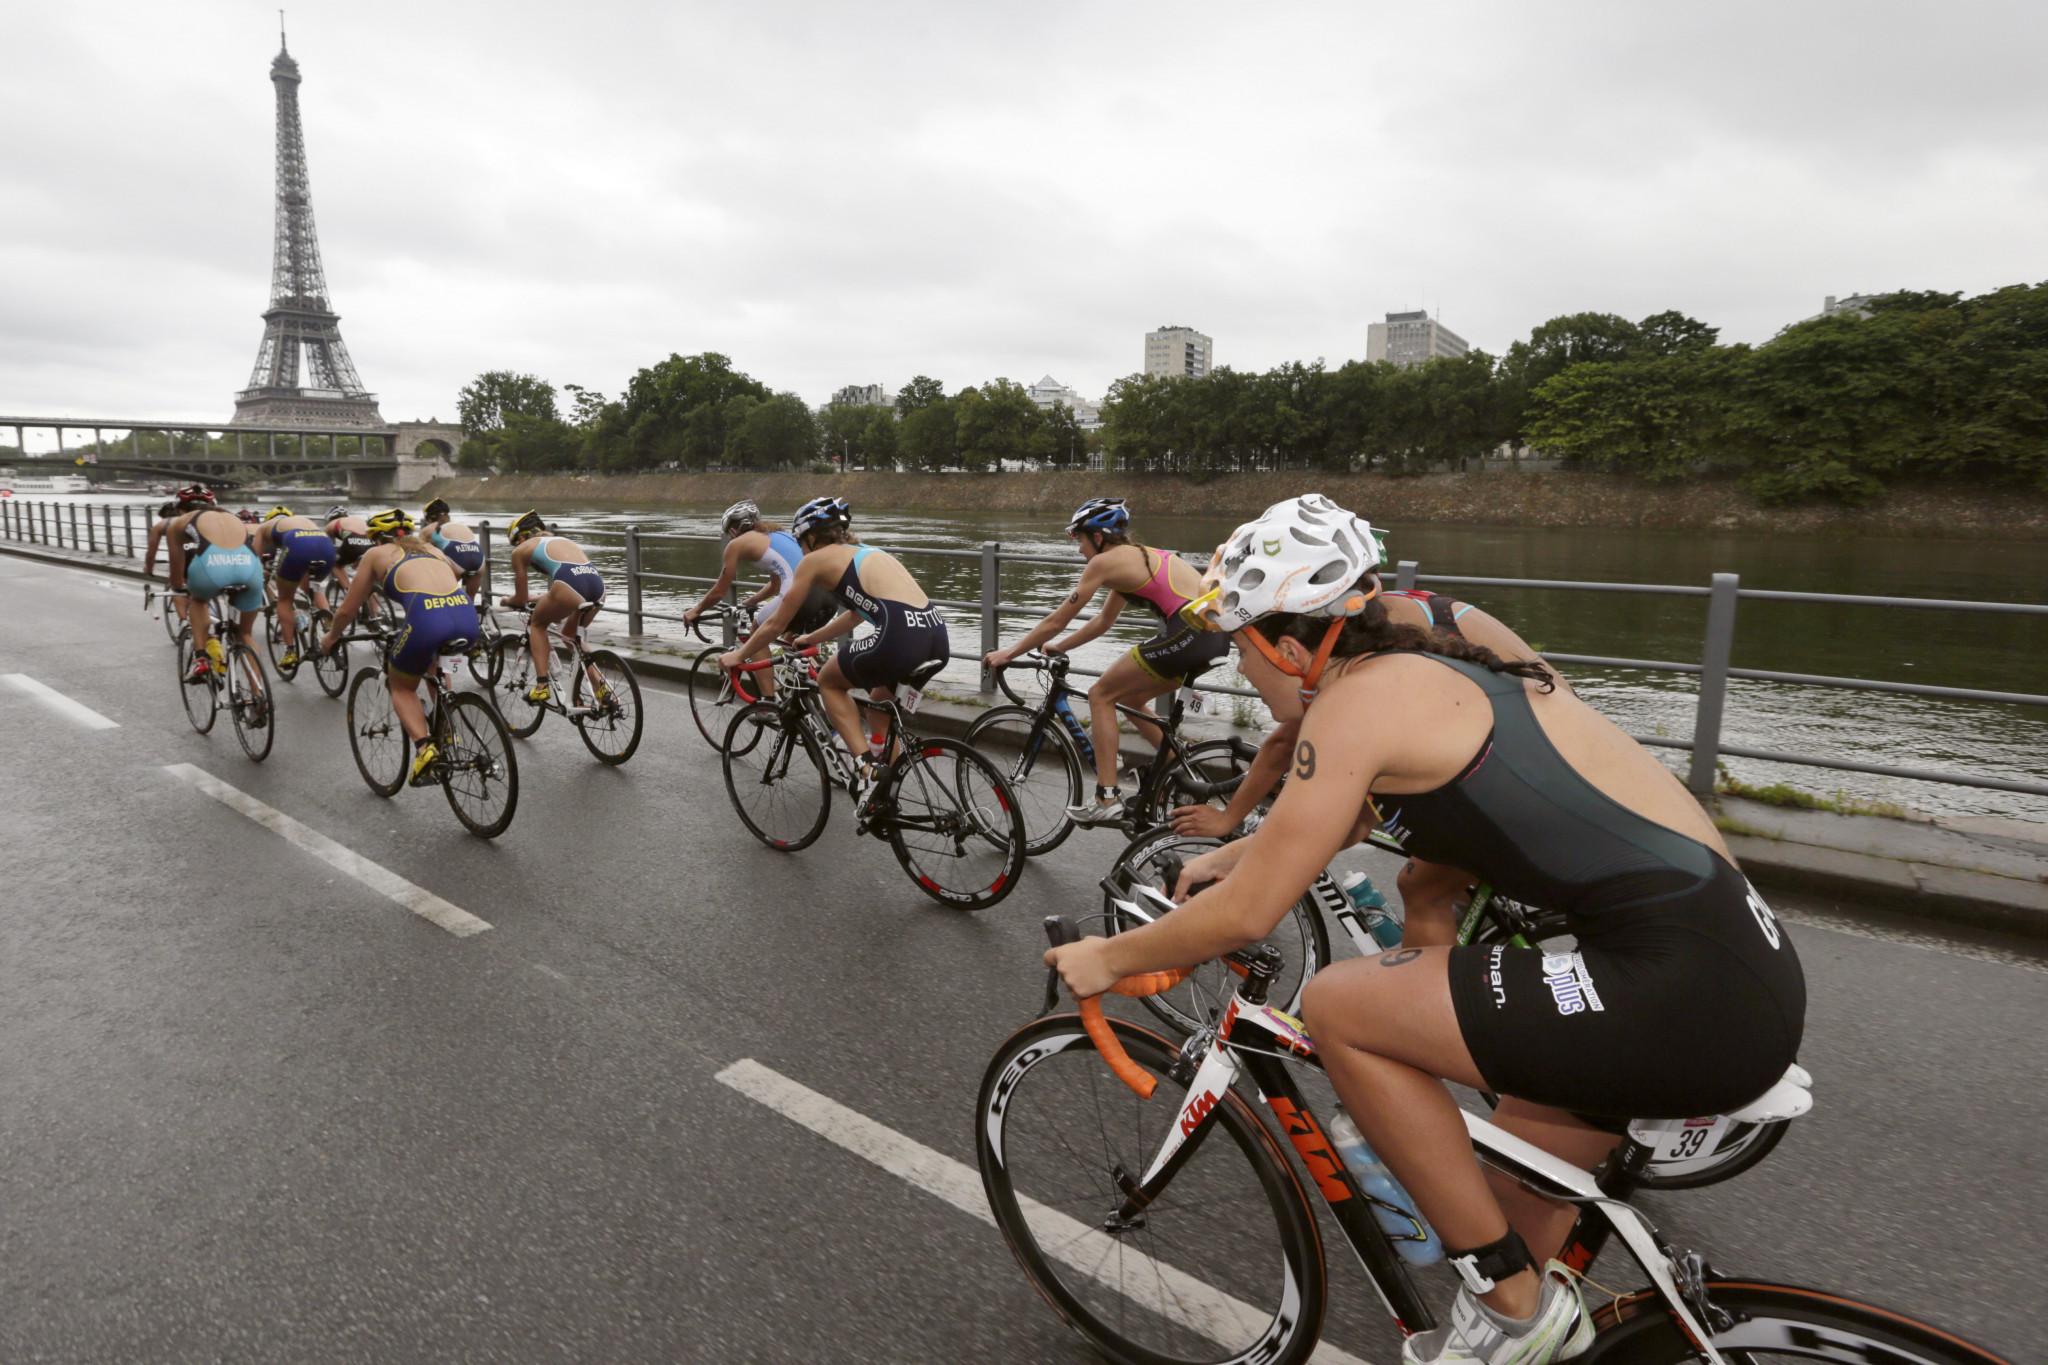 World Triathlon appoints Patti, Molina and Nikopoulos as Paris 2024 technical delegates